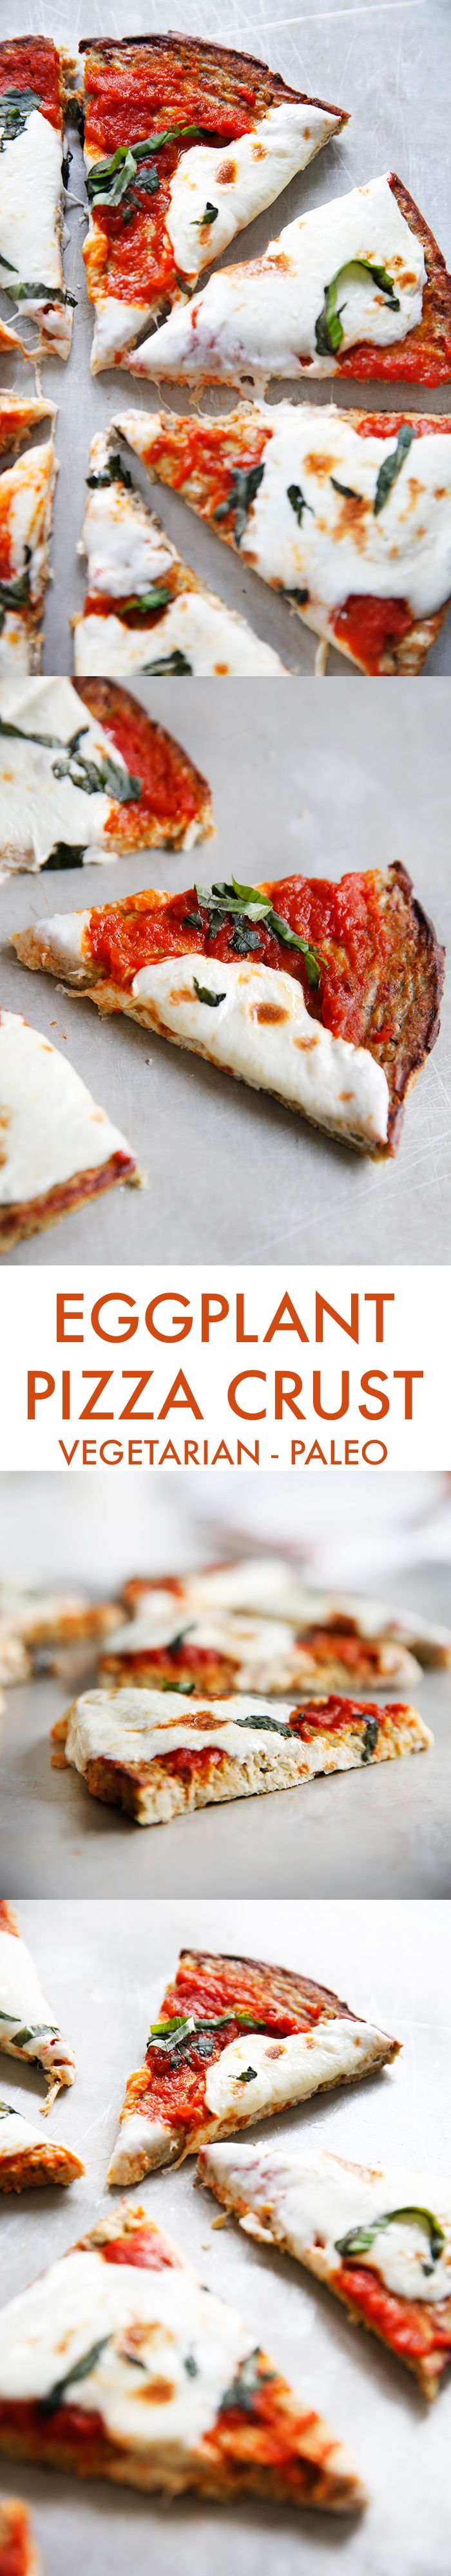 Paleo Eggplant Pizza Crust - Lexi's Clean Kitchen